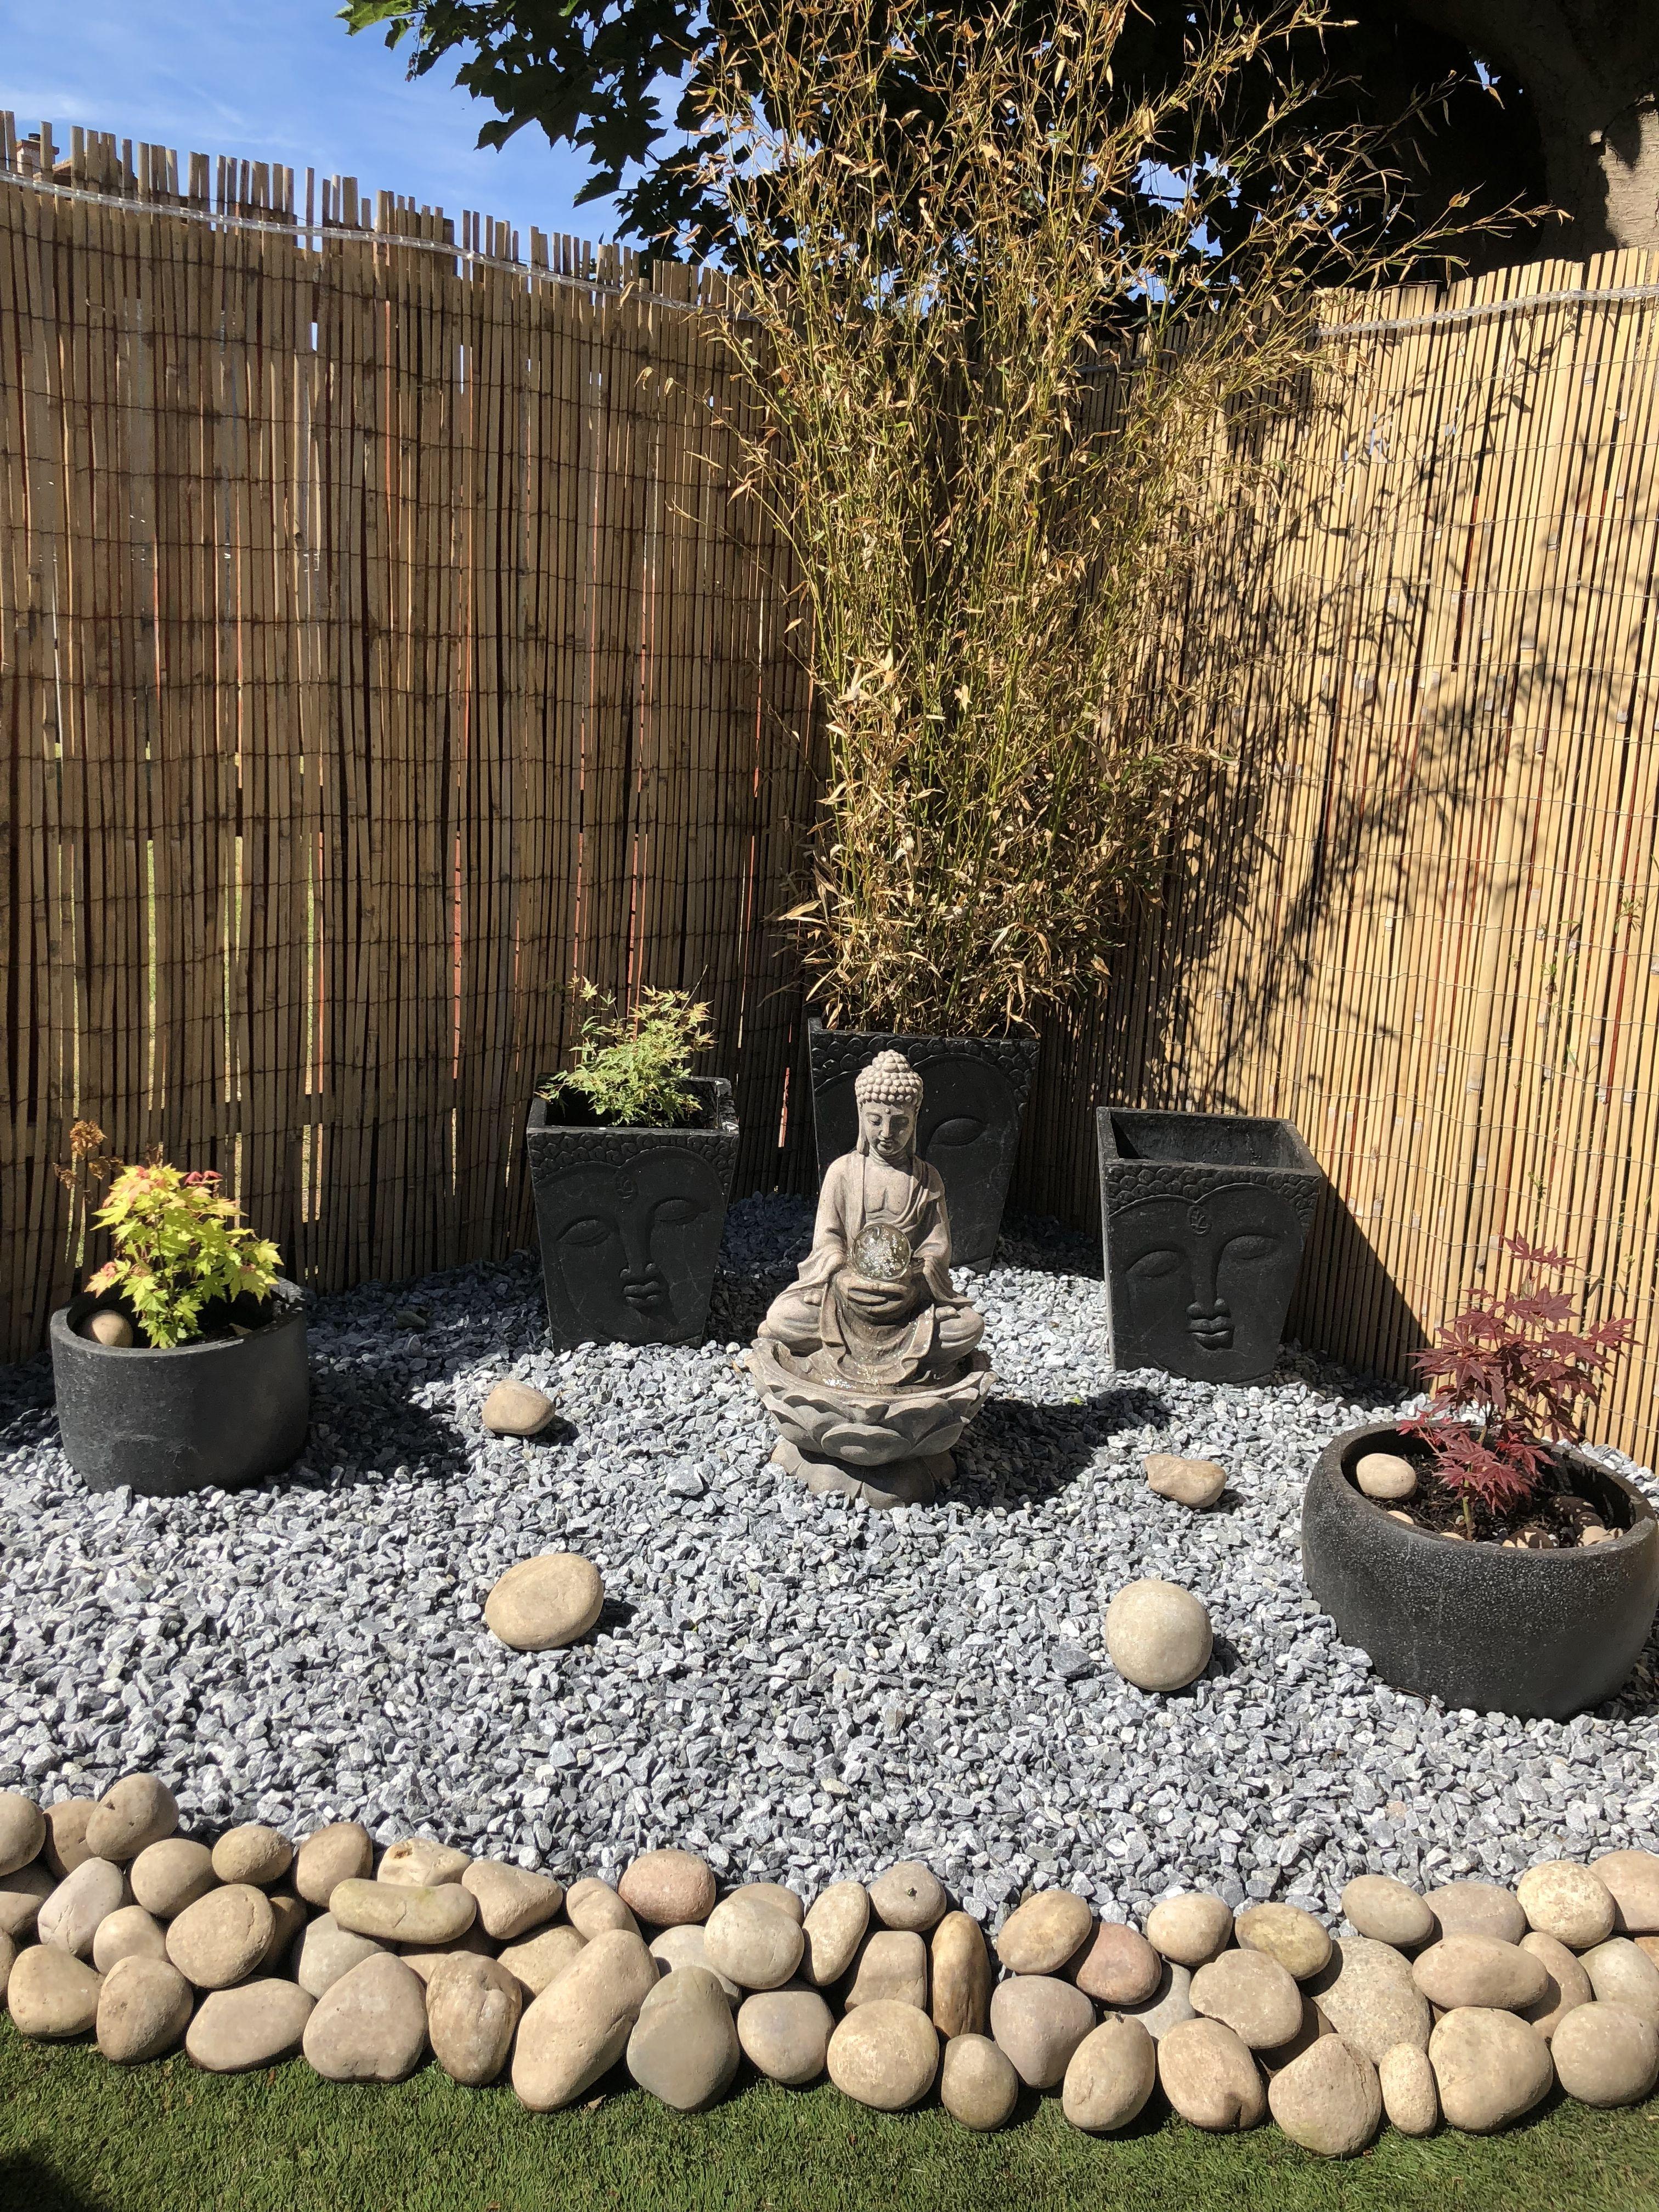 Meditation garden image by CATHERINE HENRICKS on zen | Zen ... on Meditation Patio Ideas id=19541